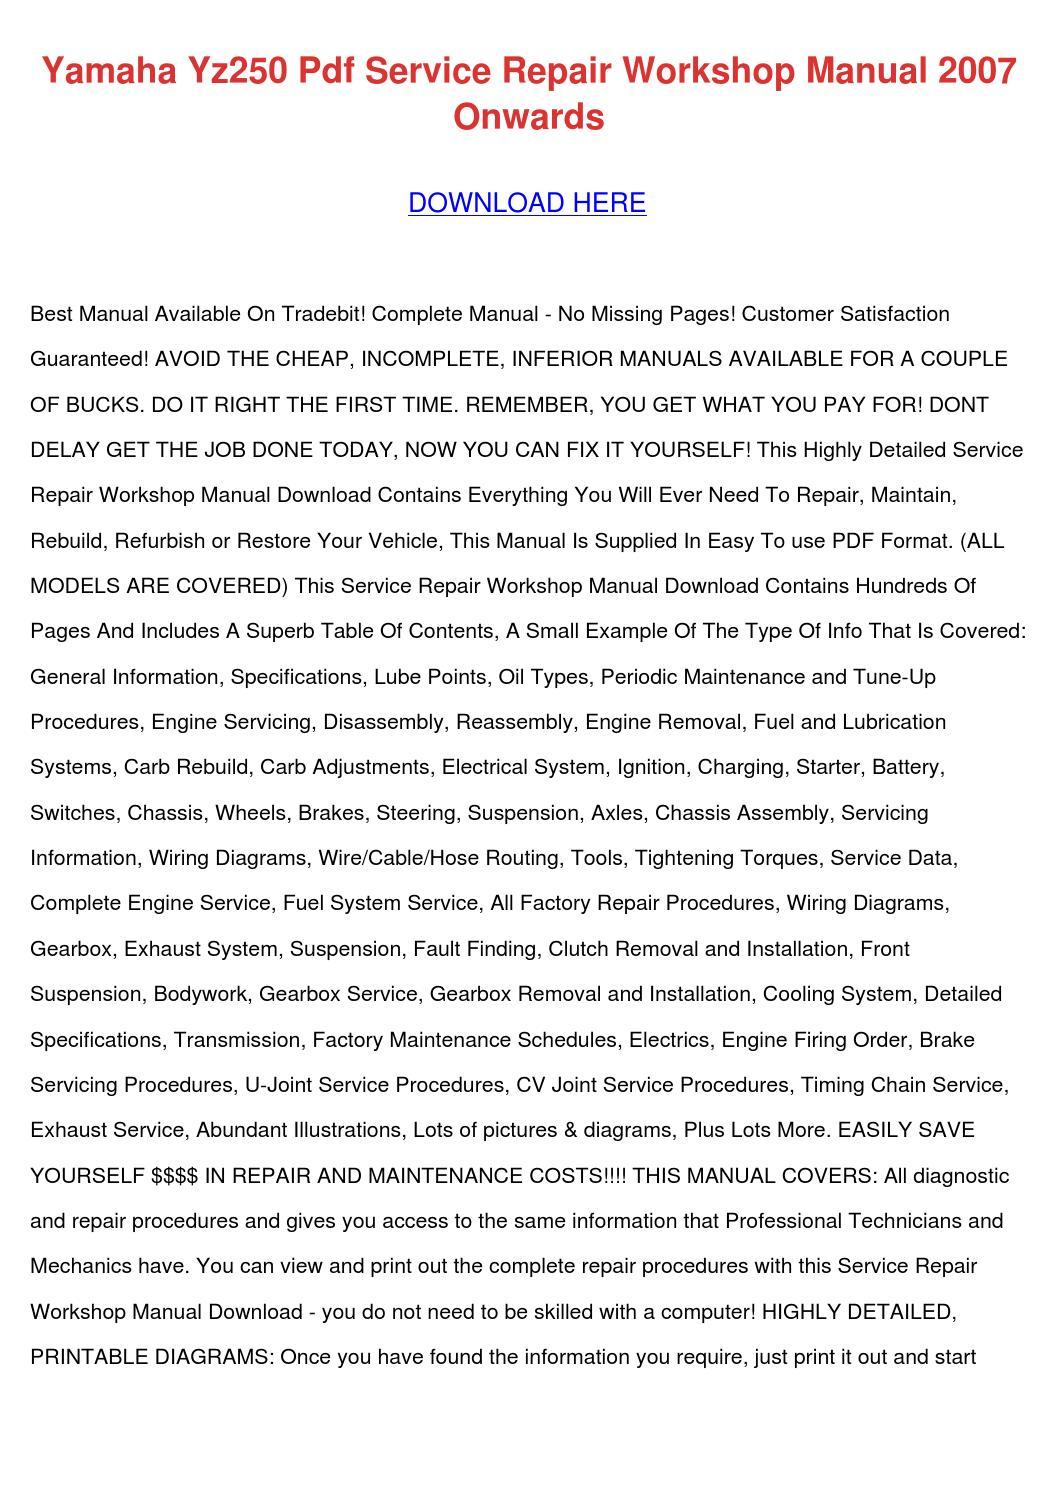 hight resolution of yamaha yz250 pdf service repair workshop manu by jocelynheard issuuyamaha yz250 pdf service repair workshop manu